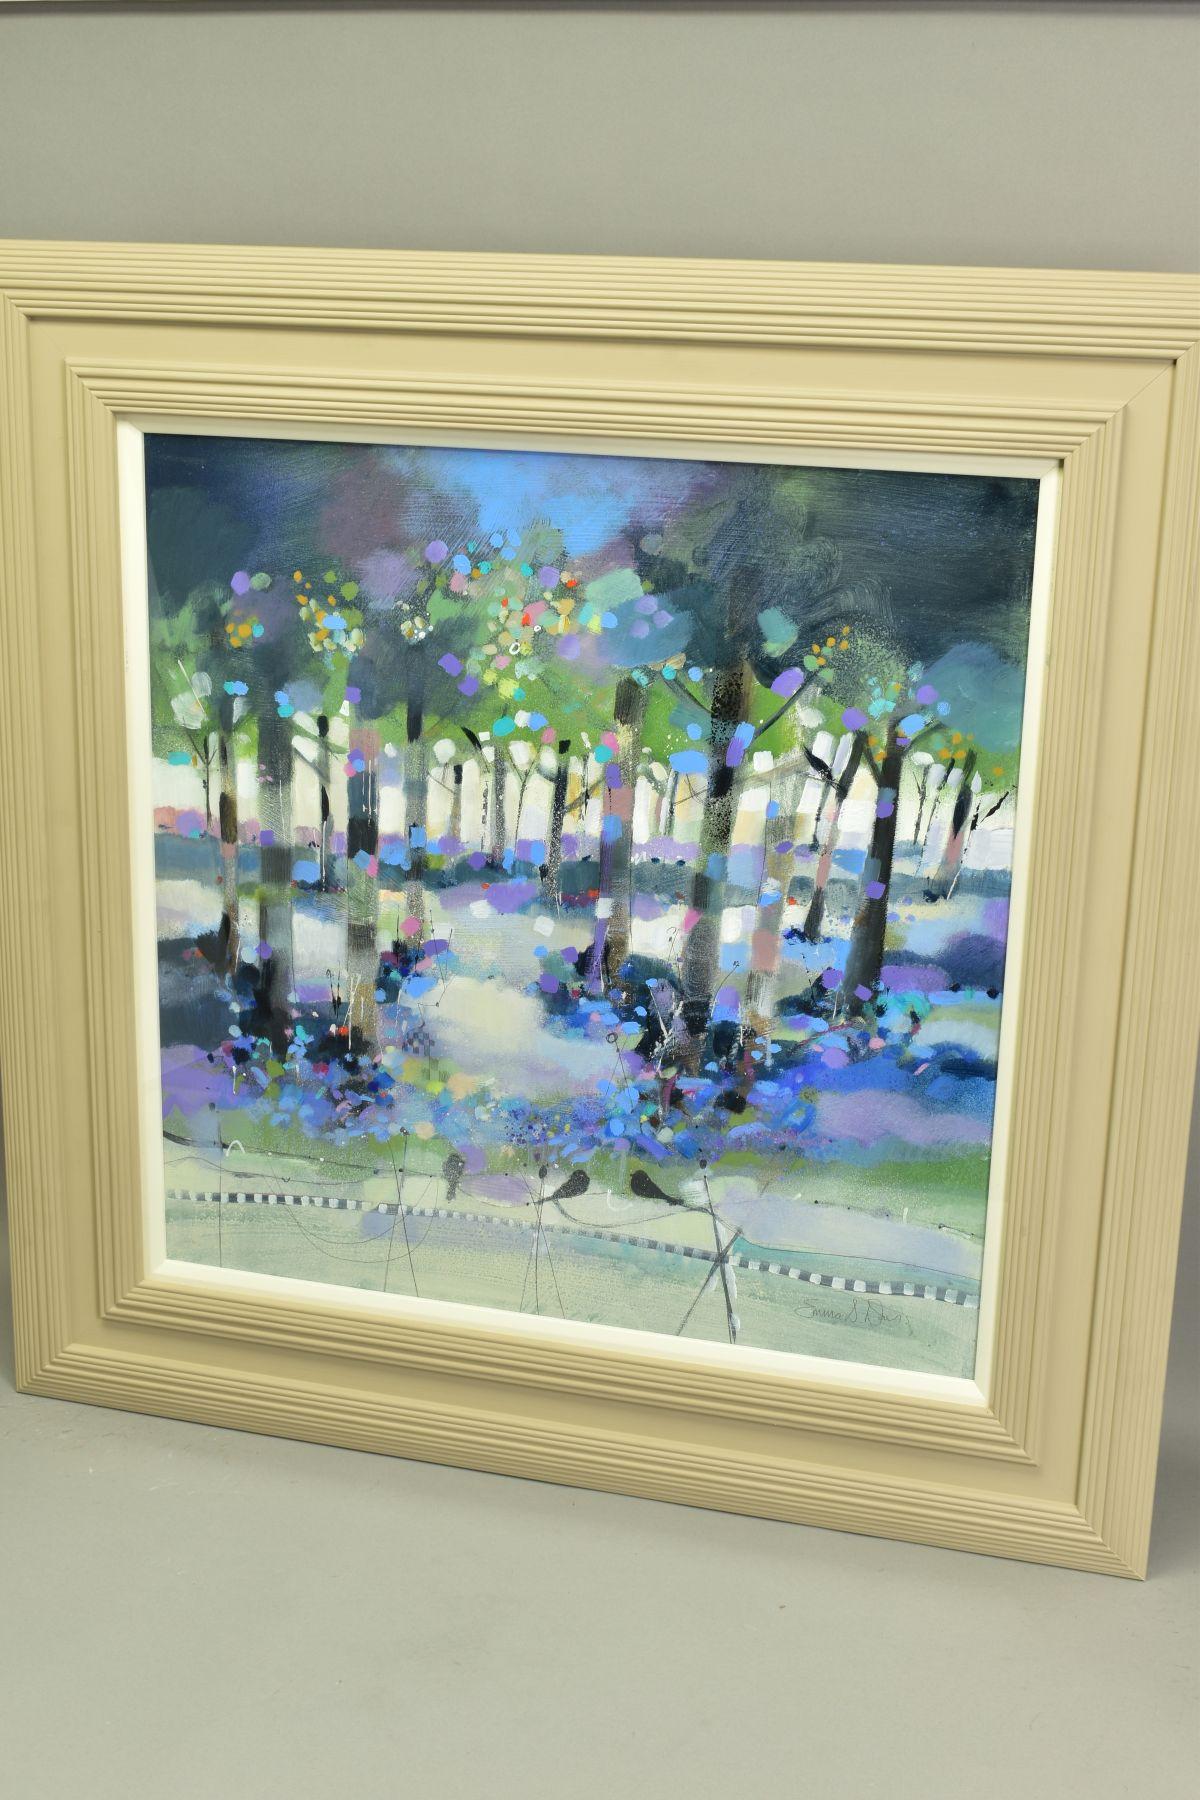 EMMA S. DAVIS (SCOTTISH 1975), 'Into The Woods', a colourful woodland landscape, signed bottom - Image 4 of 7